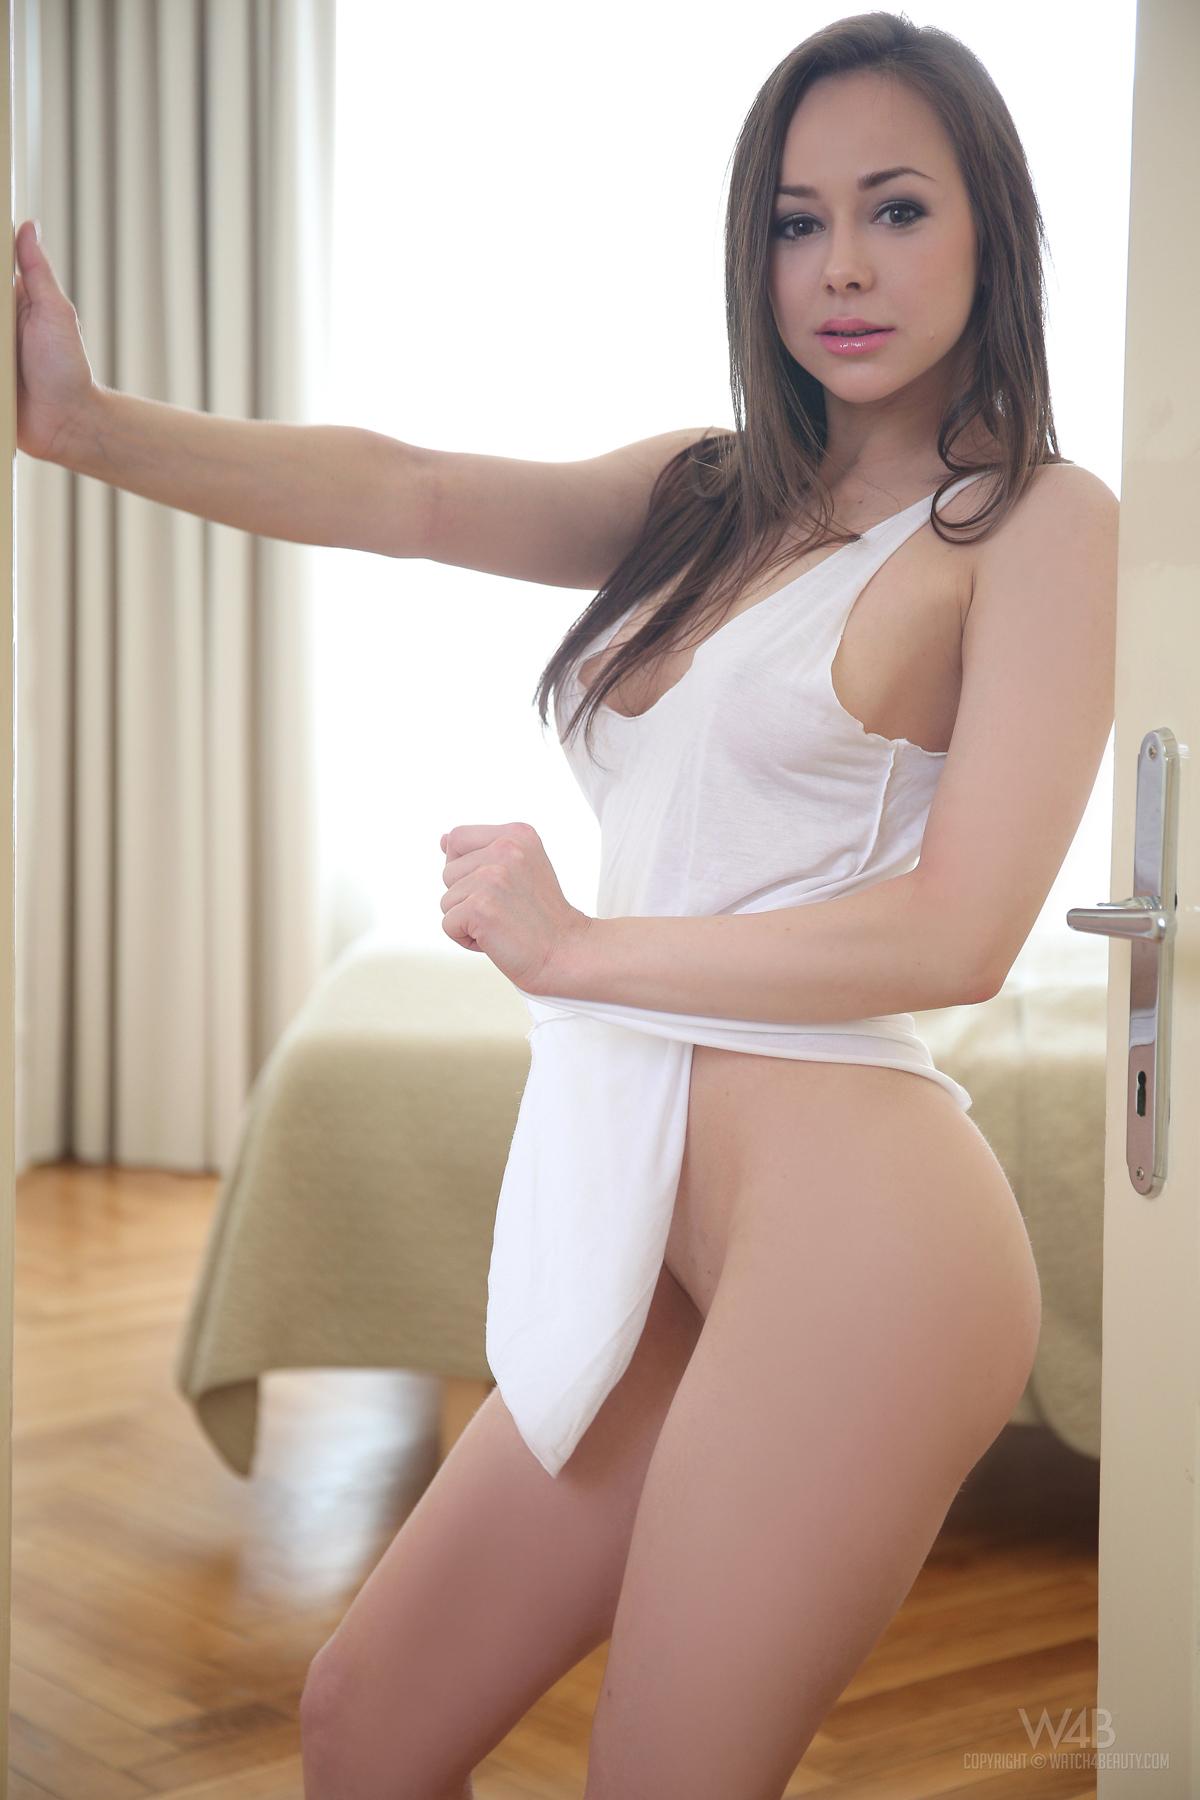 PHOTO   00 198 - Steaming Hot Teen Darisha Spreads